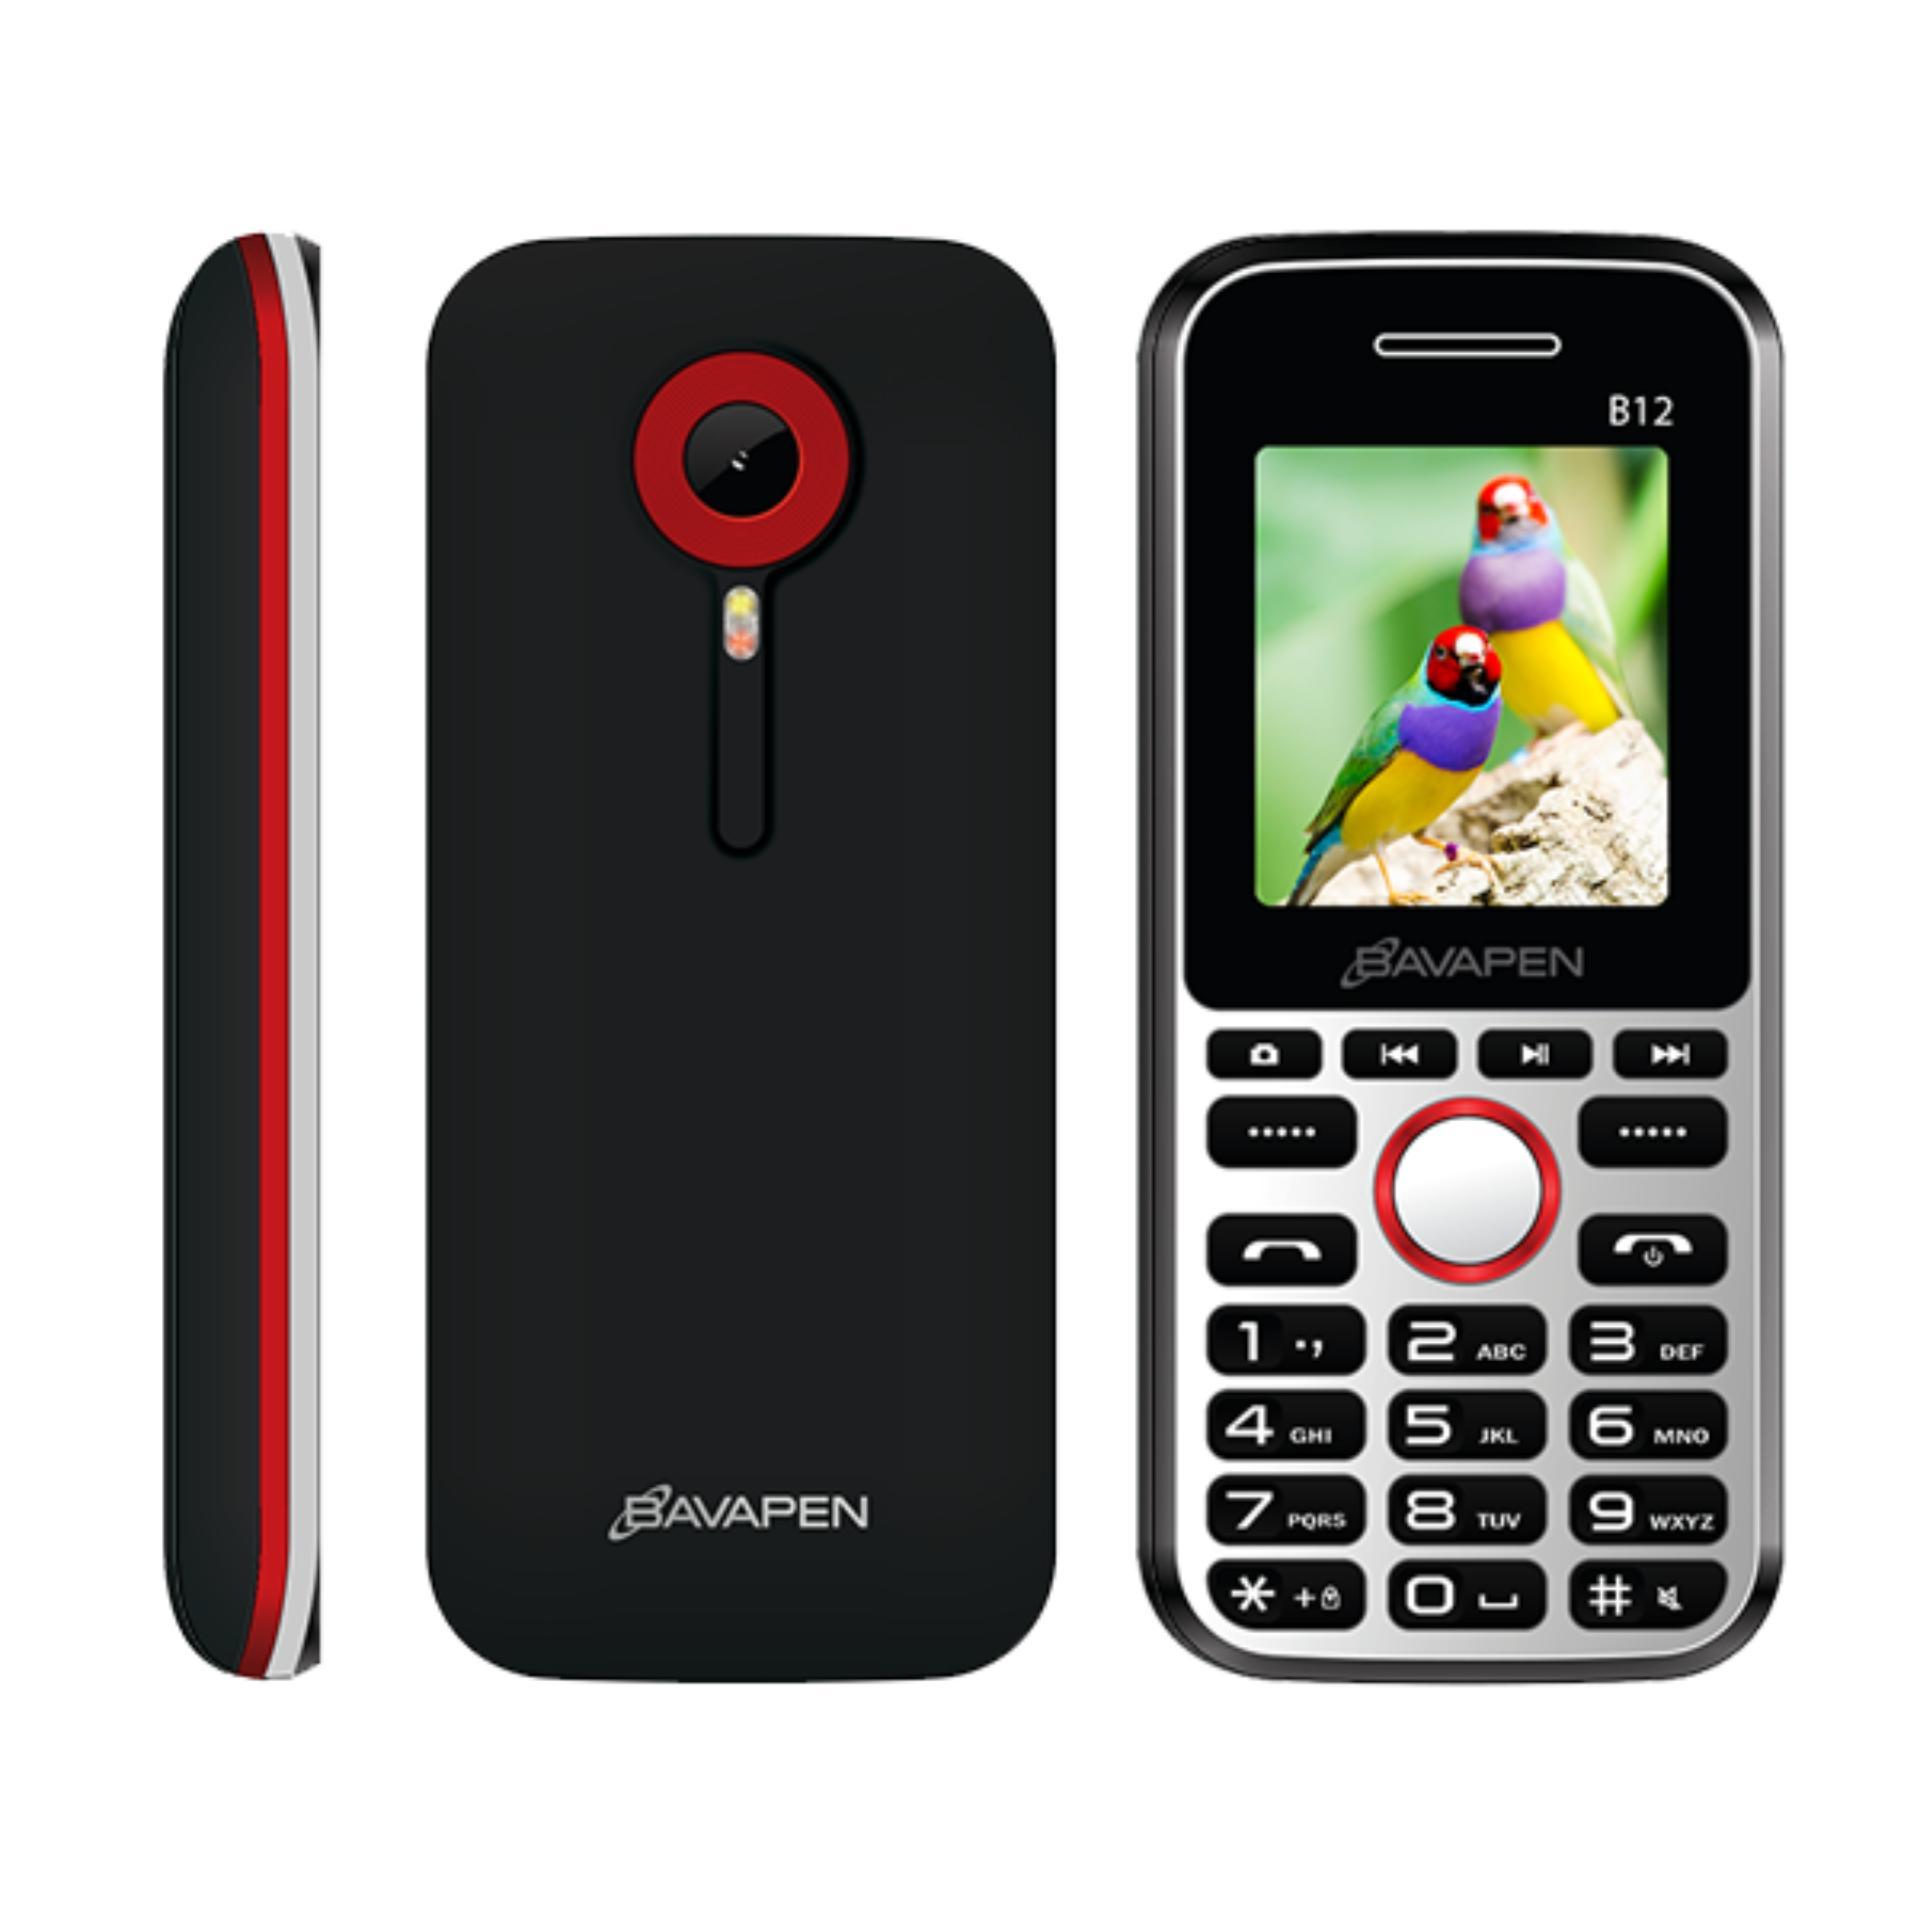 Bavapen B12 2 sim (black red)